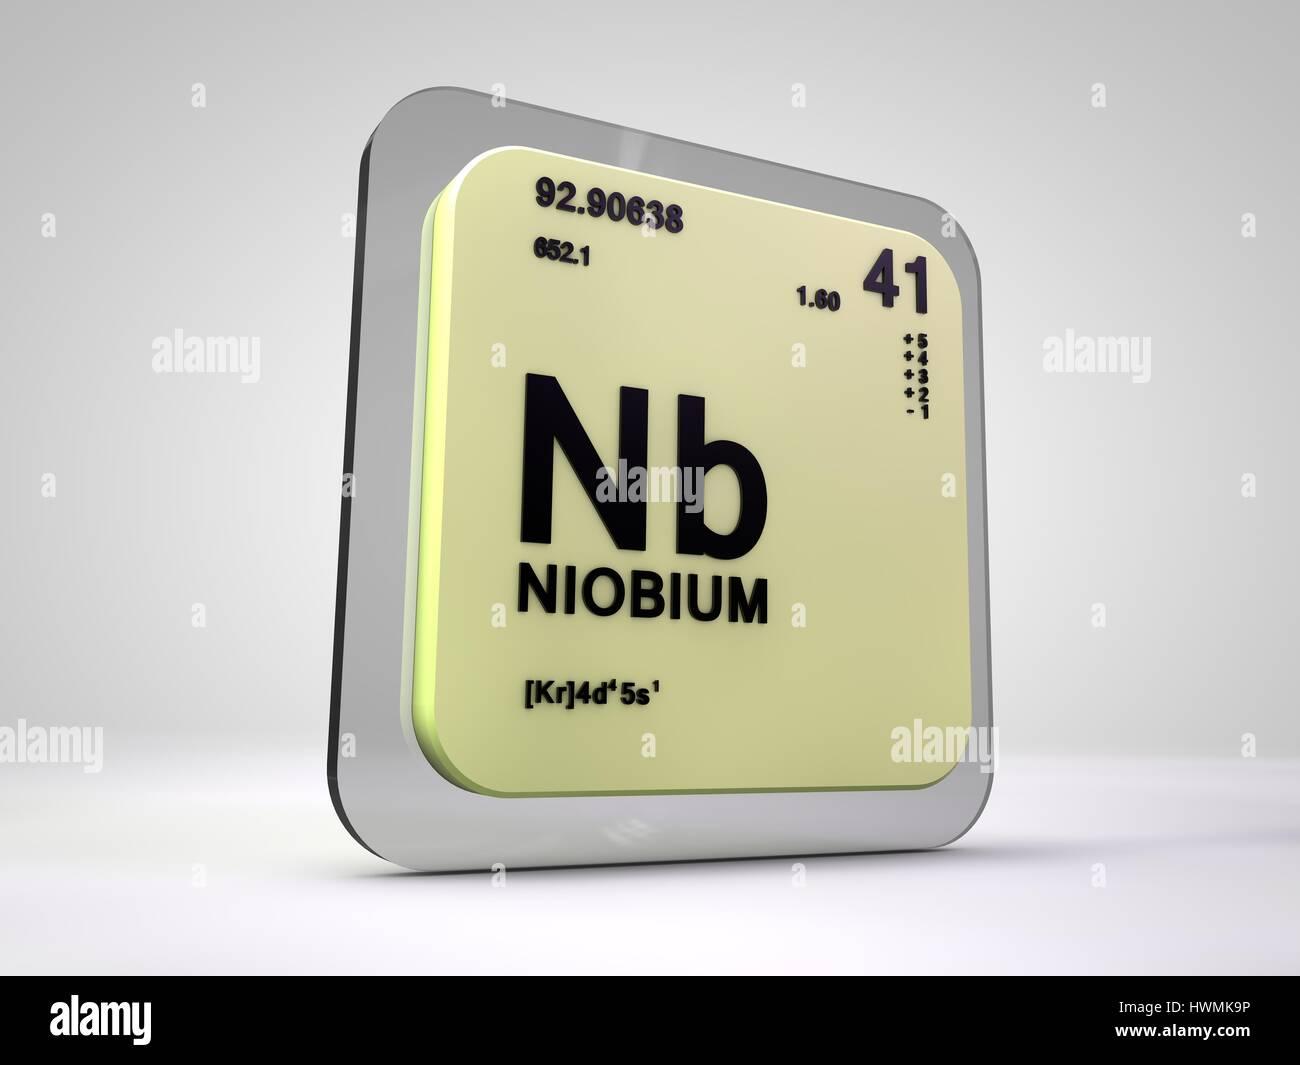 Niobio nb elemento qumico tabla peridica 3d render foto niobio nb elemento qumico tabla peridica 3d render urtaz Gallery